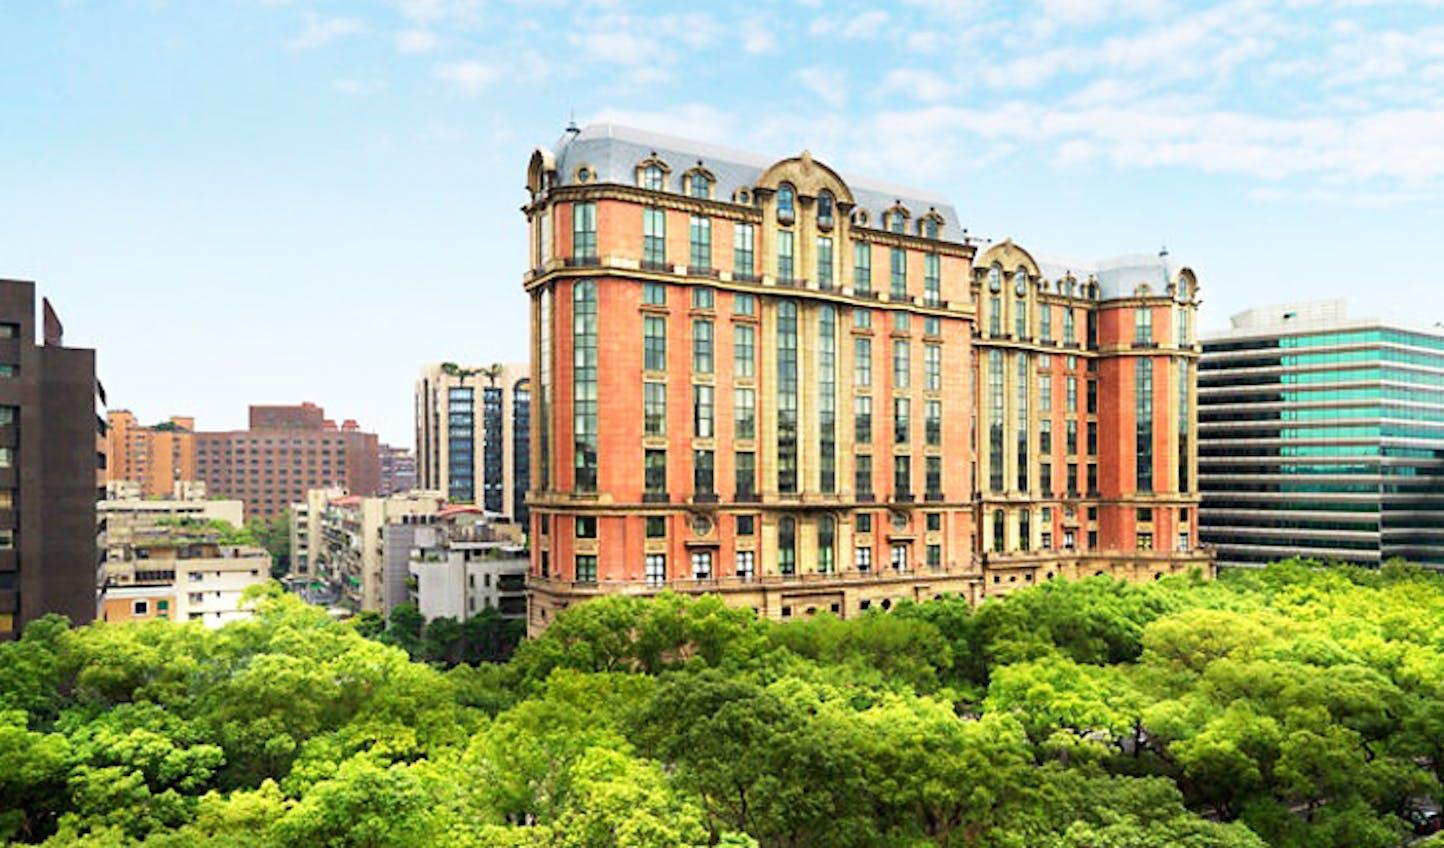 An outside view of the Mandarin Oriental, Taipei